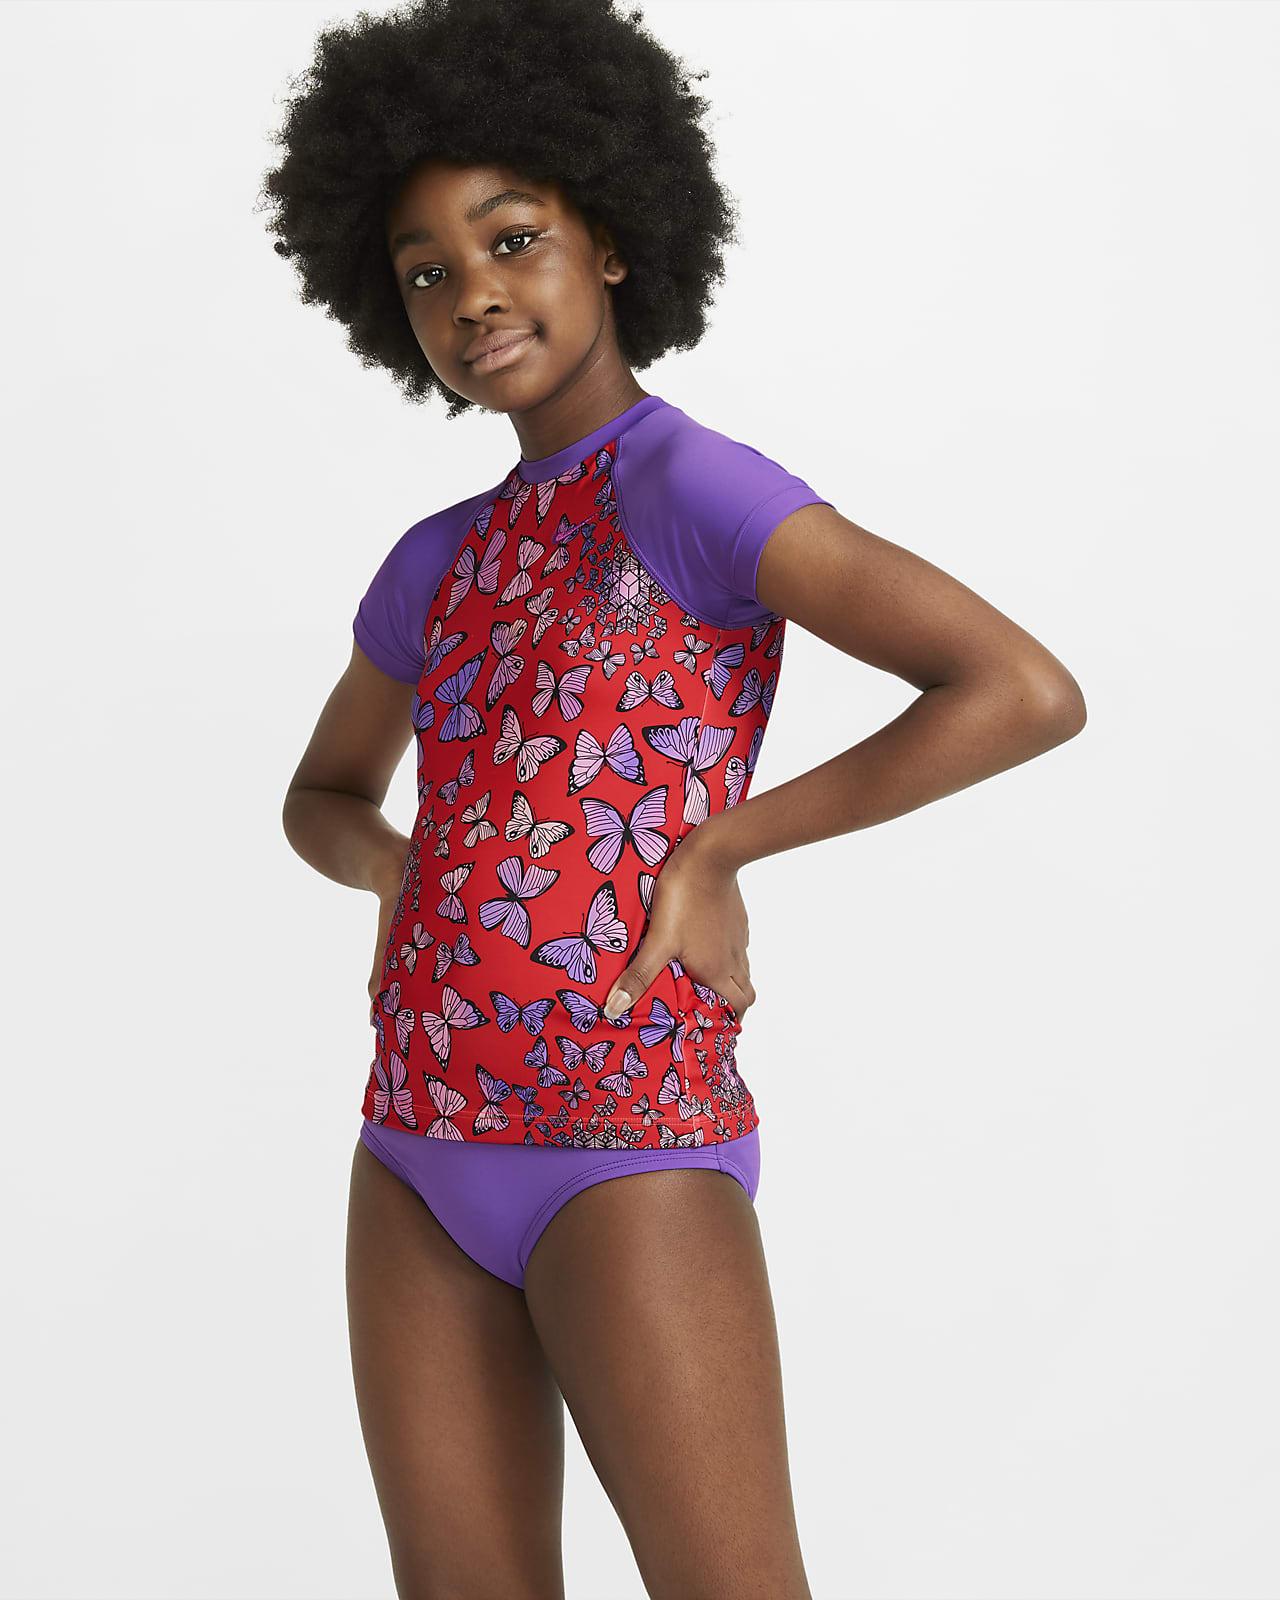 Nike Big Kids' (Girls') Short-Sleeve 2-Piece Swim Set